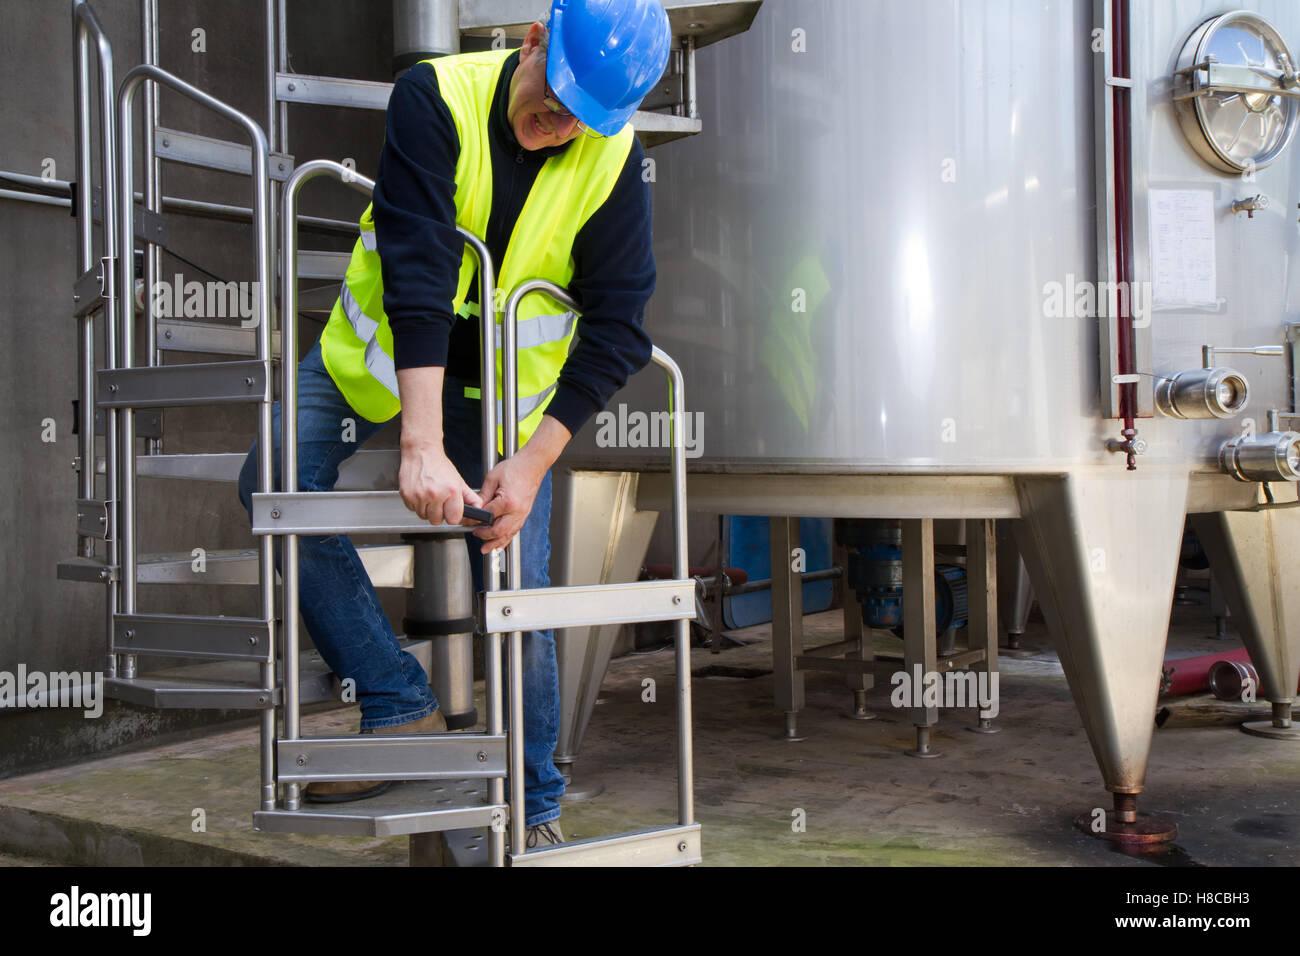 skilled worker making maintenance in industrila premises - Stock Image